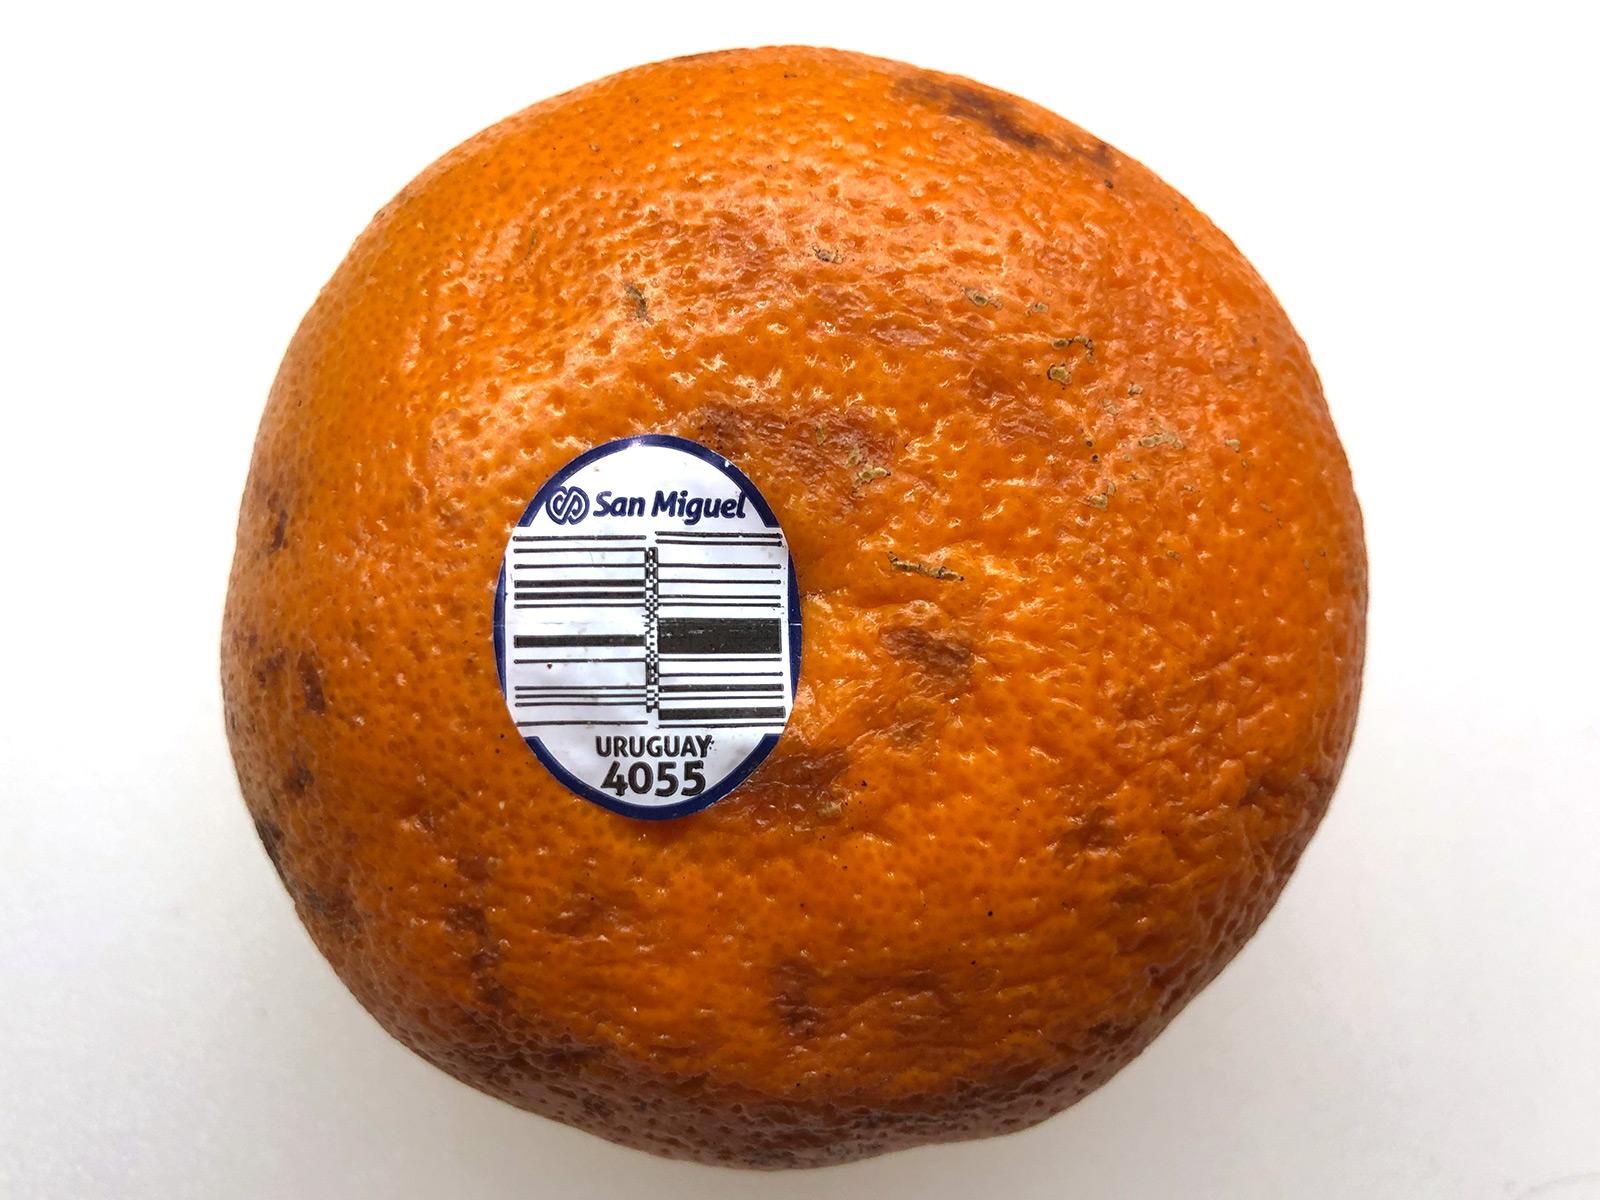 4055-tangerine-uruguay.jpg